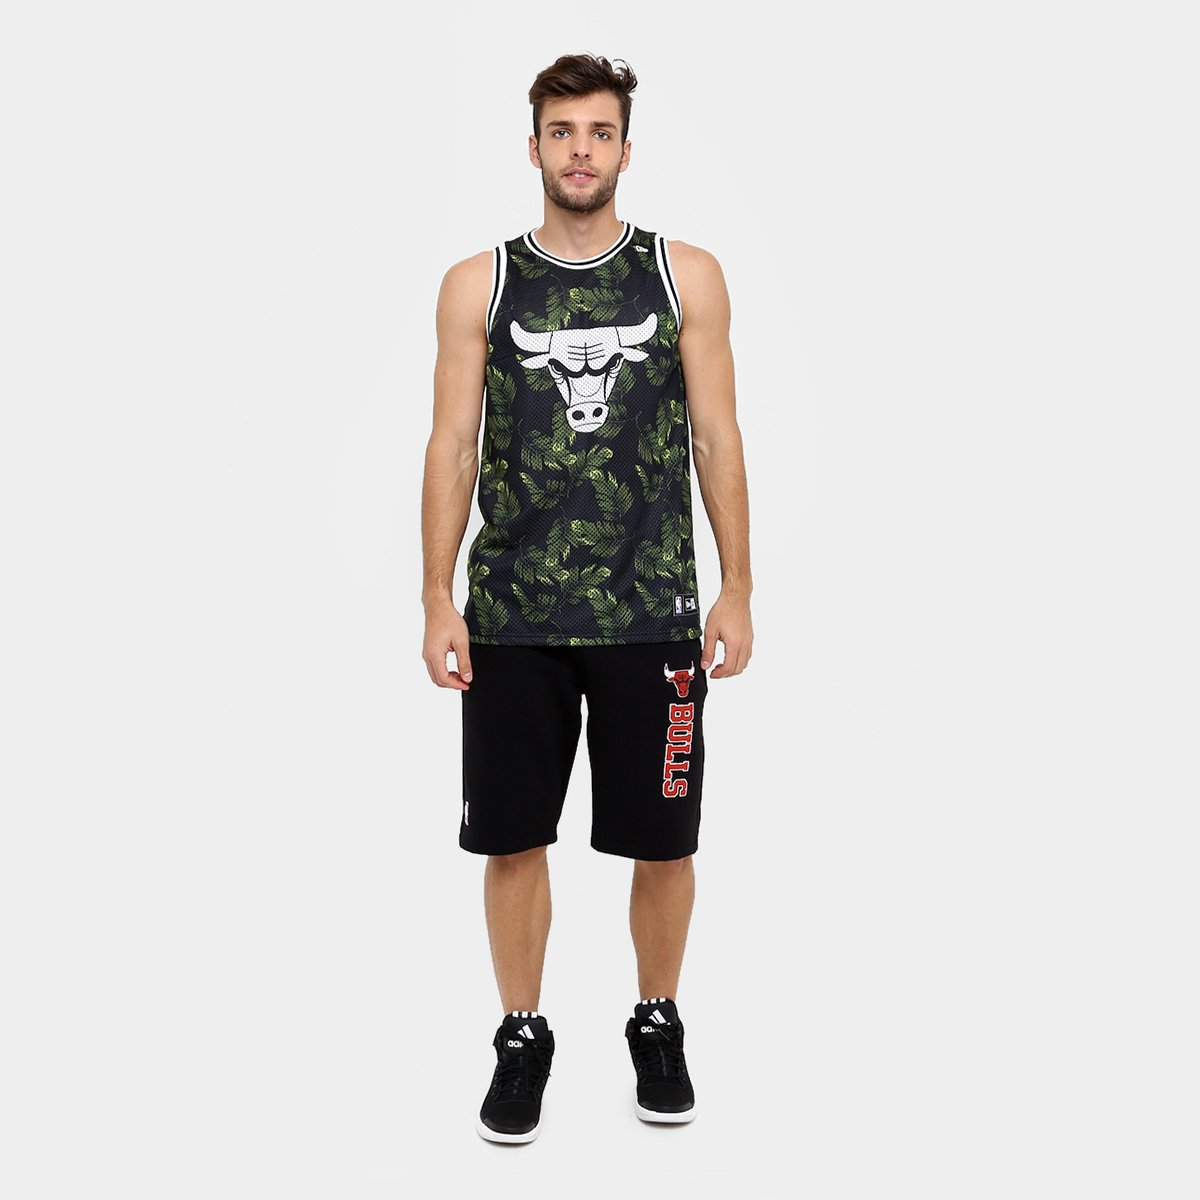 Camiseta Regata New Era NBA Jersey Palm Camo Chicago Bulls  bed4ddf1b1f